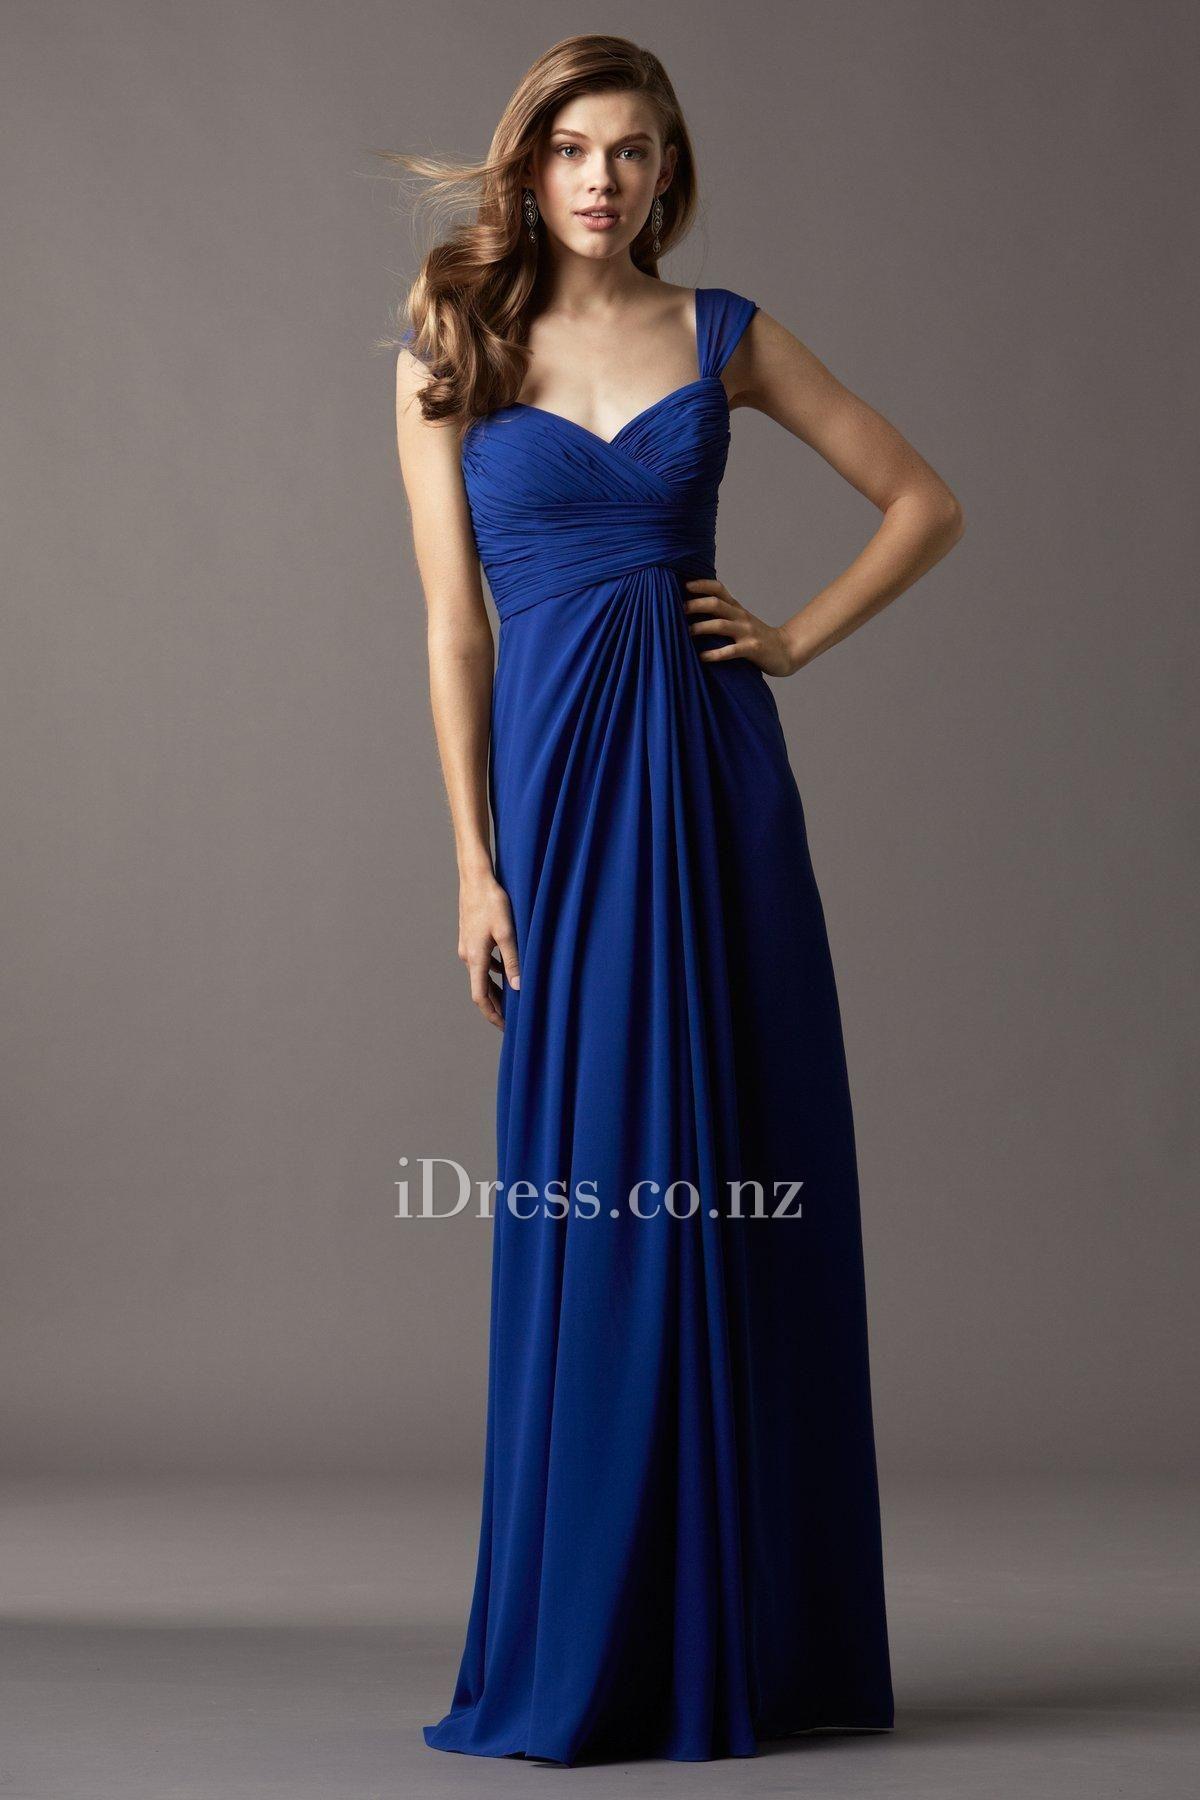 Chiffon Shirred Wide Strap Floor Length Royal Blue Bridesmaid Dress Watters Bridesmaid Dresses Royal Blue Bridesmaid Dresses Long Bridesmaid Dresses